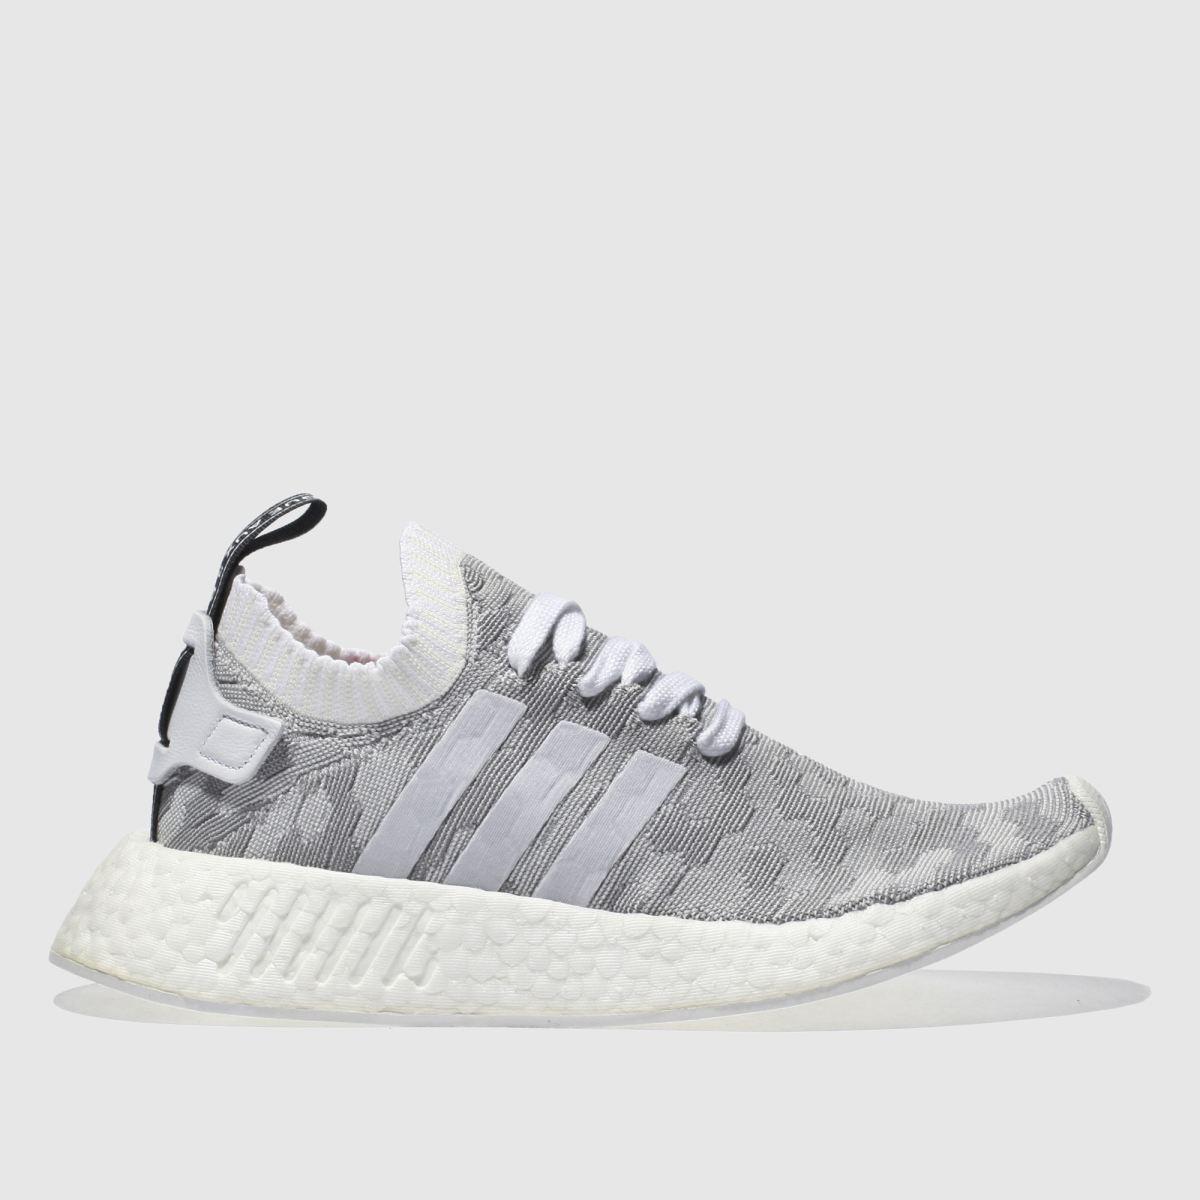 adidas light grey nmd_r2 primeknit trainers